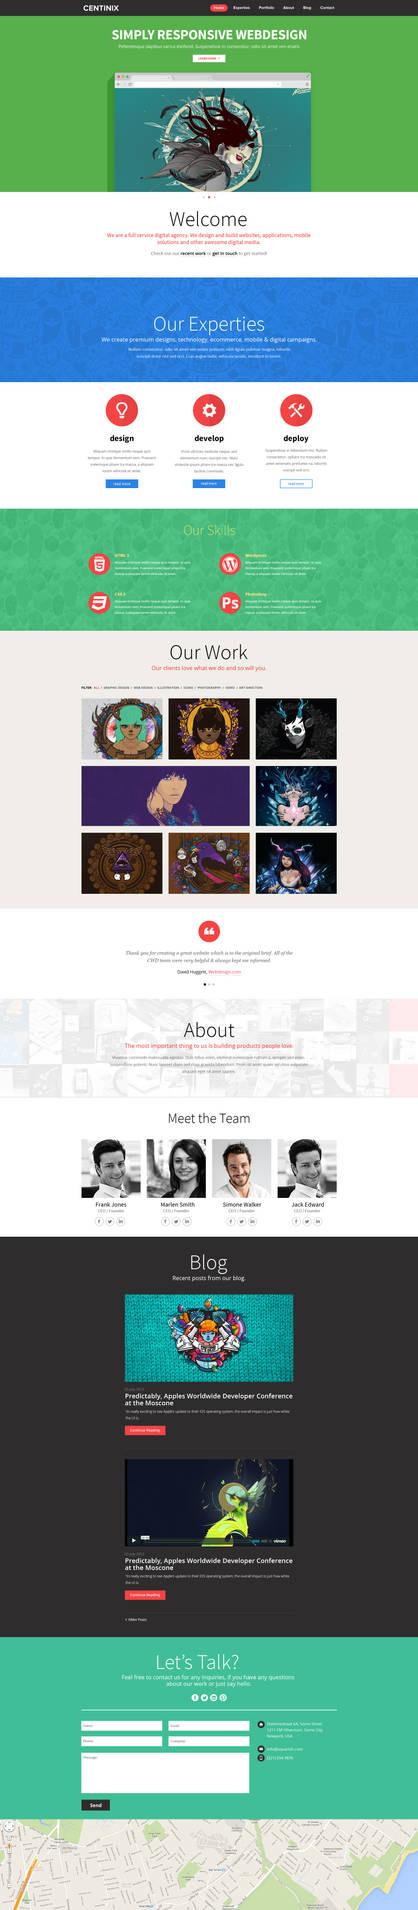 Centinix Responsive Website